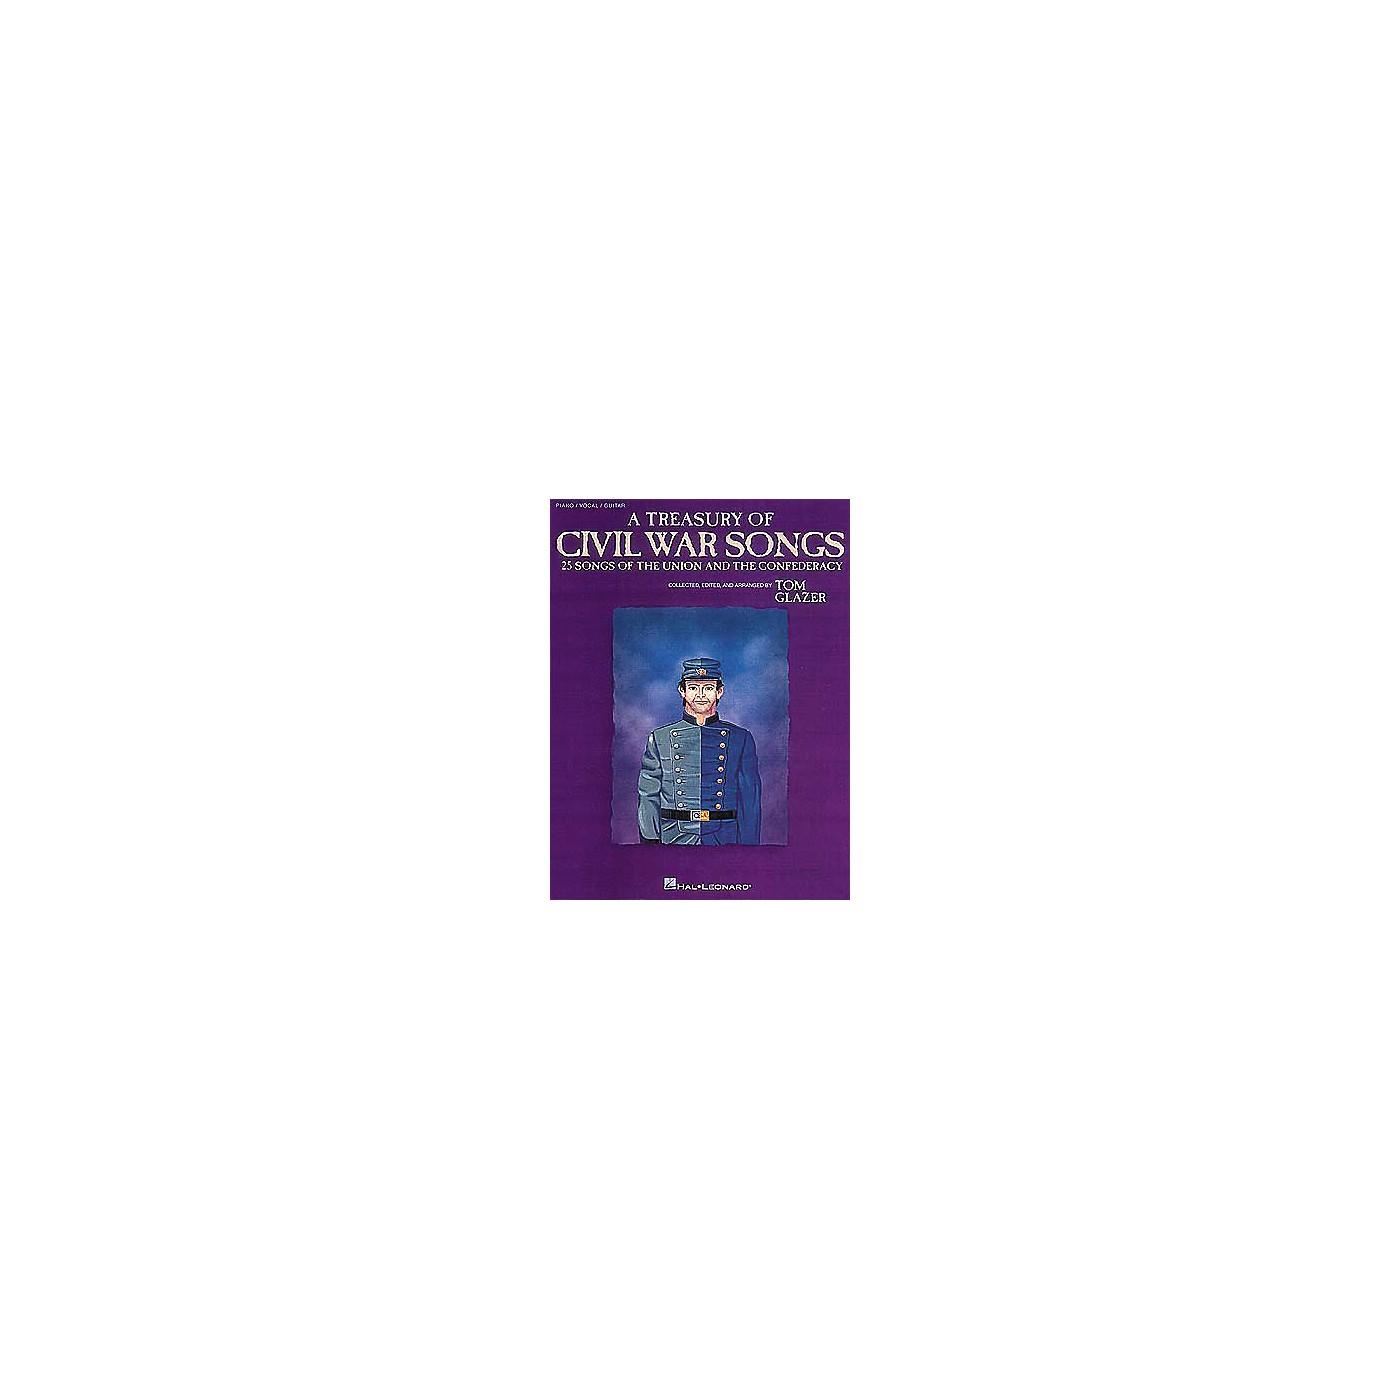 Hal Leonard A Treasury of Civil War Songs Piano/Vocal/Guitar Songbook thumbnail